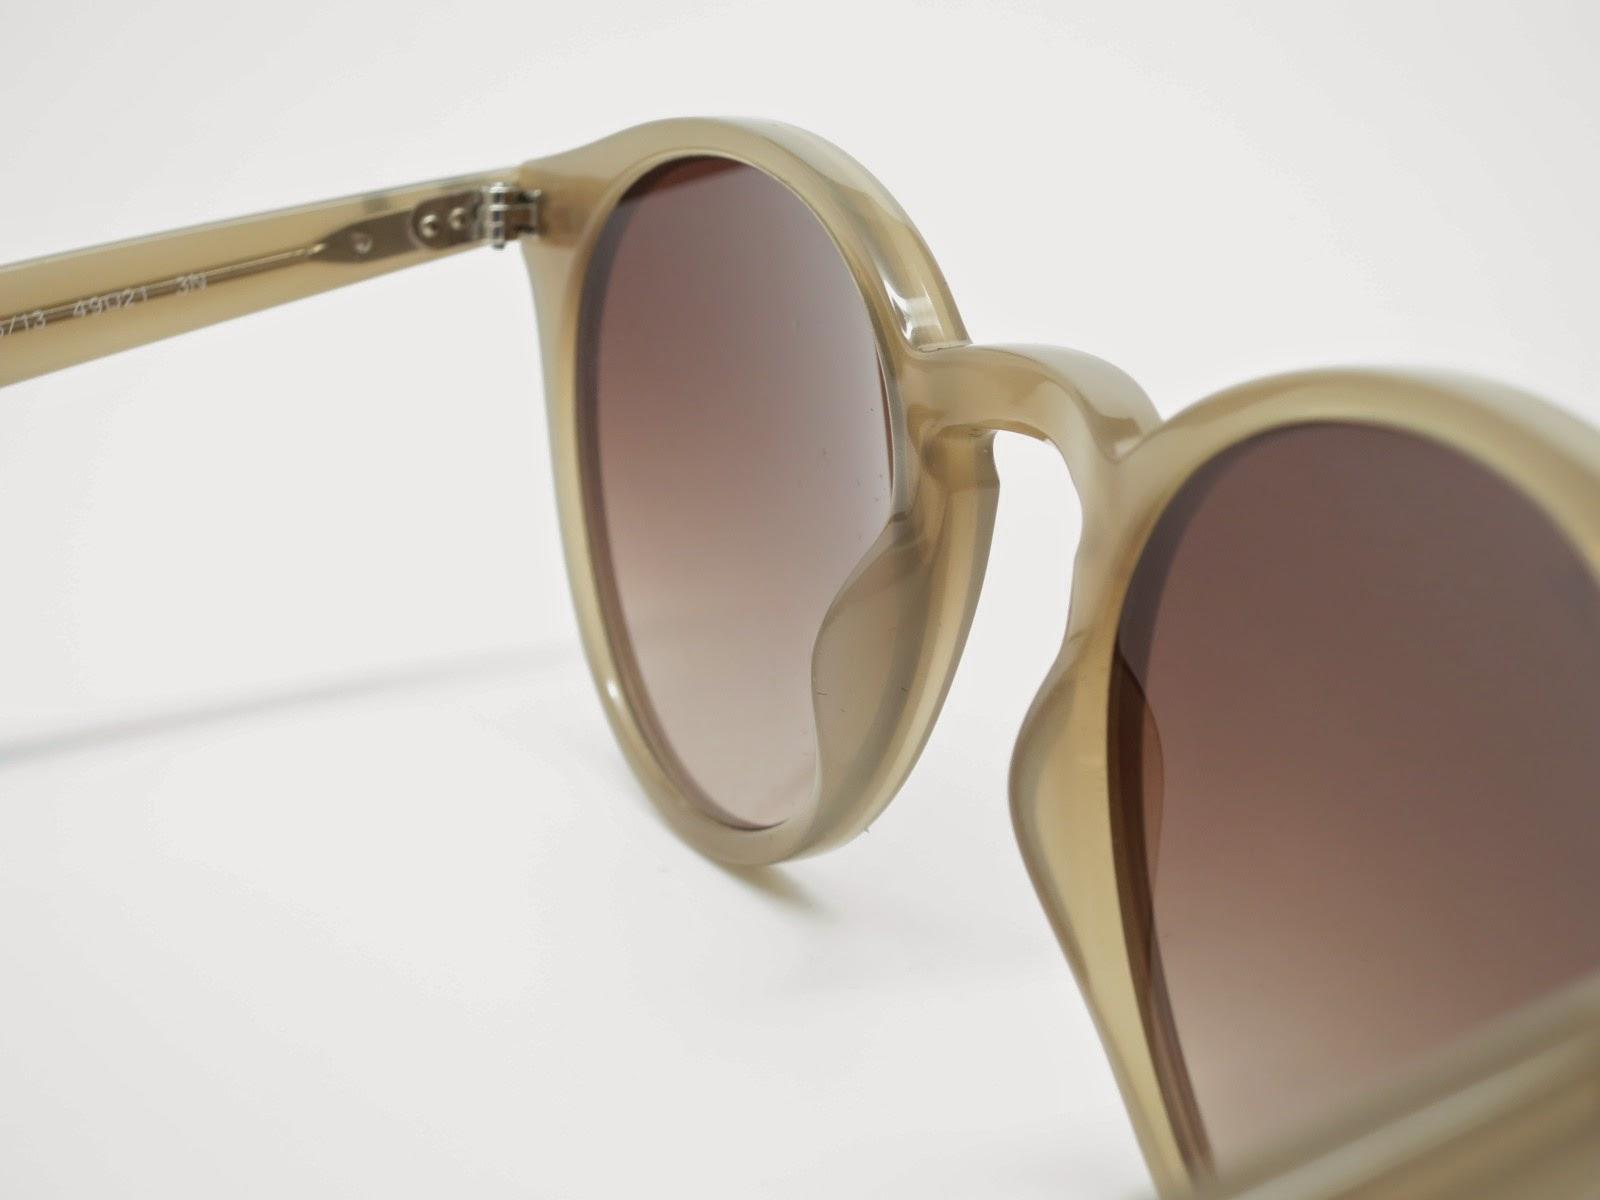 ray ban rb 2180 6166 13 turtle dove sunglasses i love. Black Bedroom Furniture Sets. Home Design Ideas